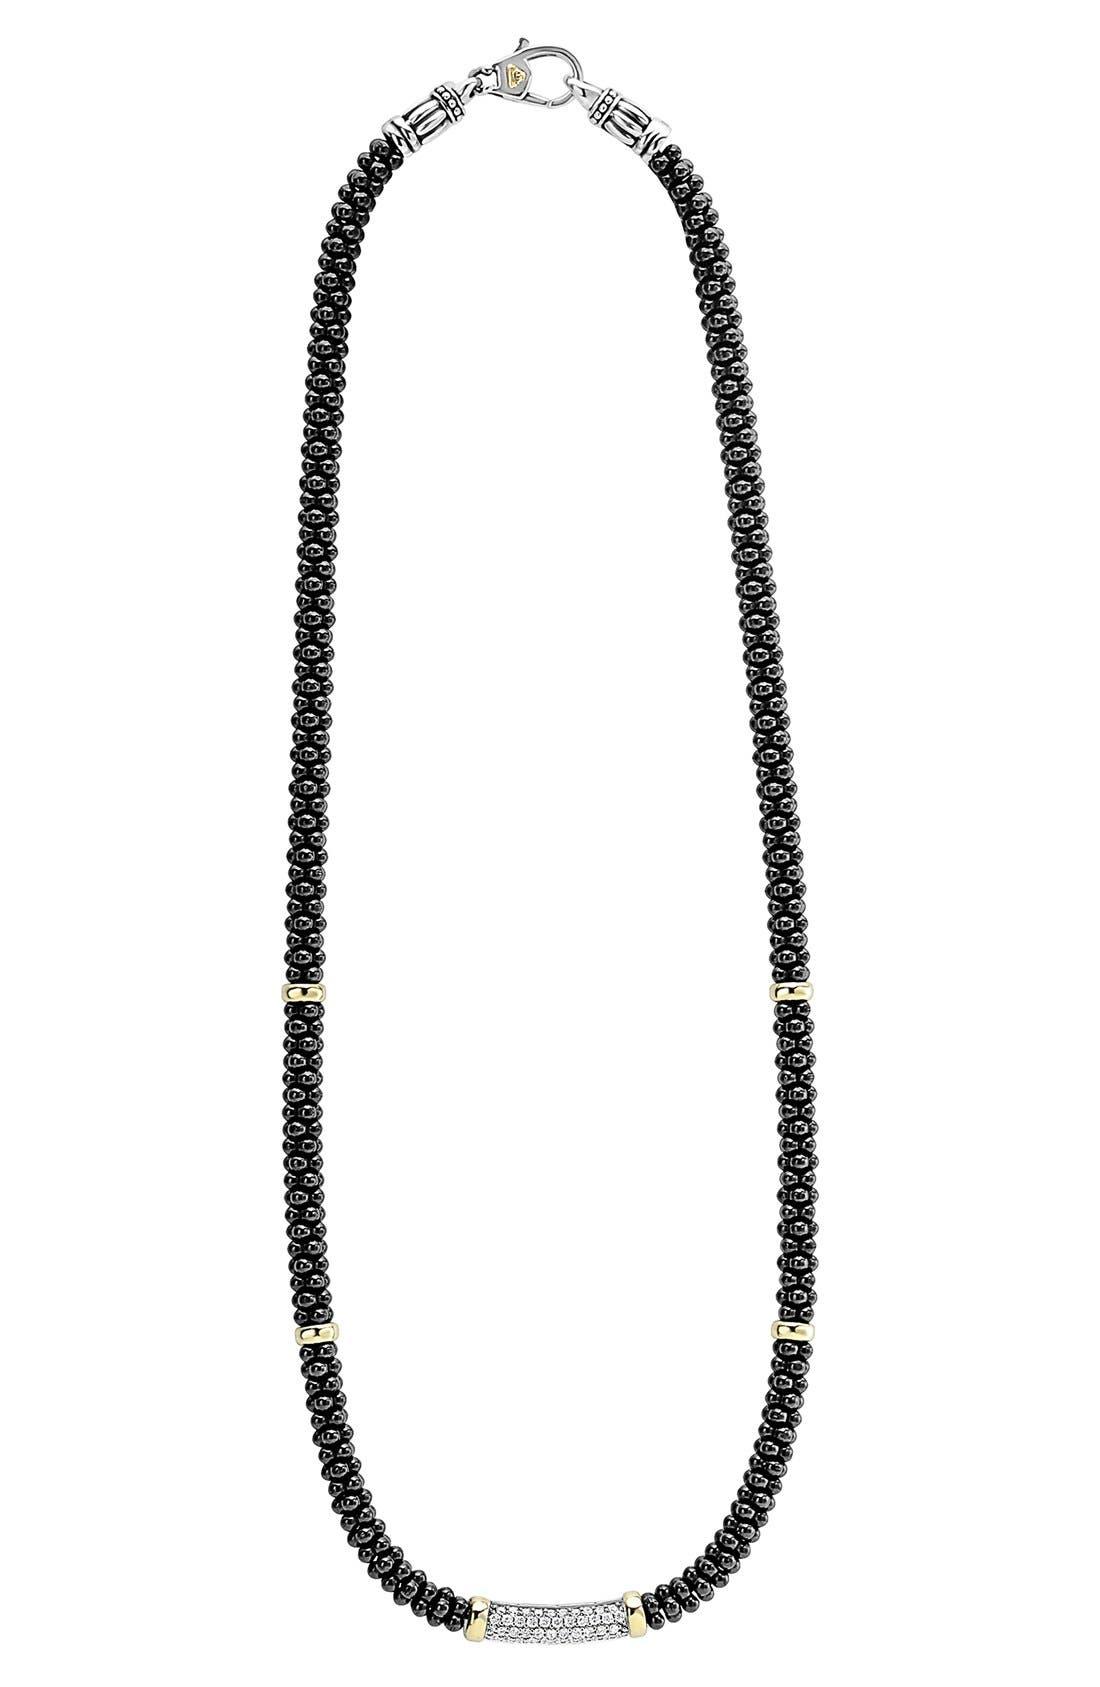 'Black Caviar' 5mm Beaded DiamondBar Necklace,                             Alternate thumbnail 2, color,                             Black Caviar/ Gold